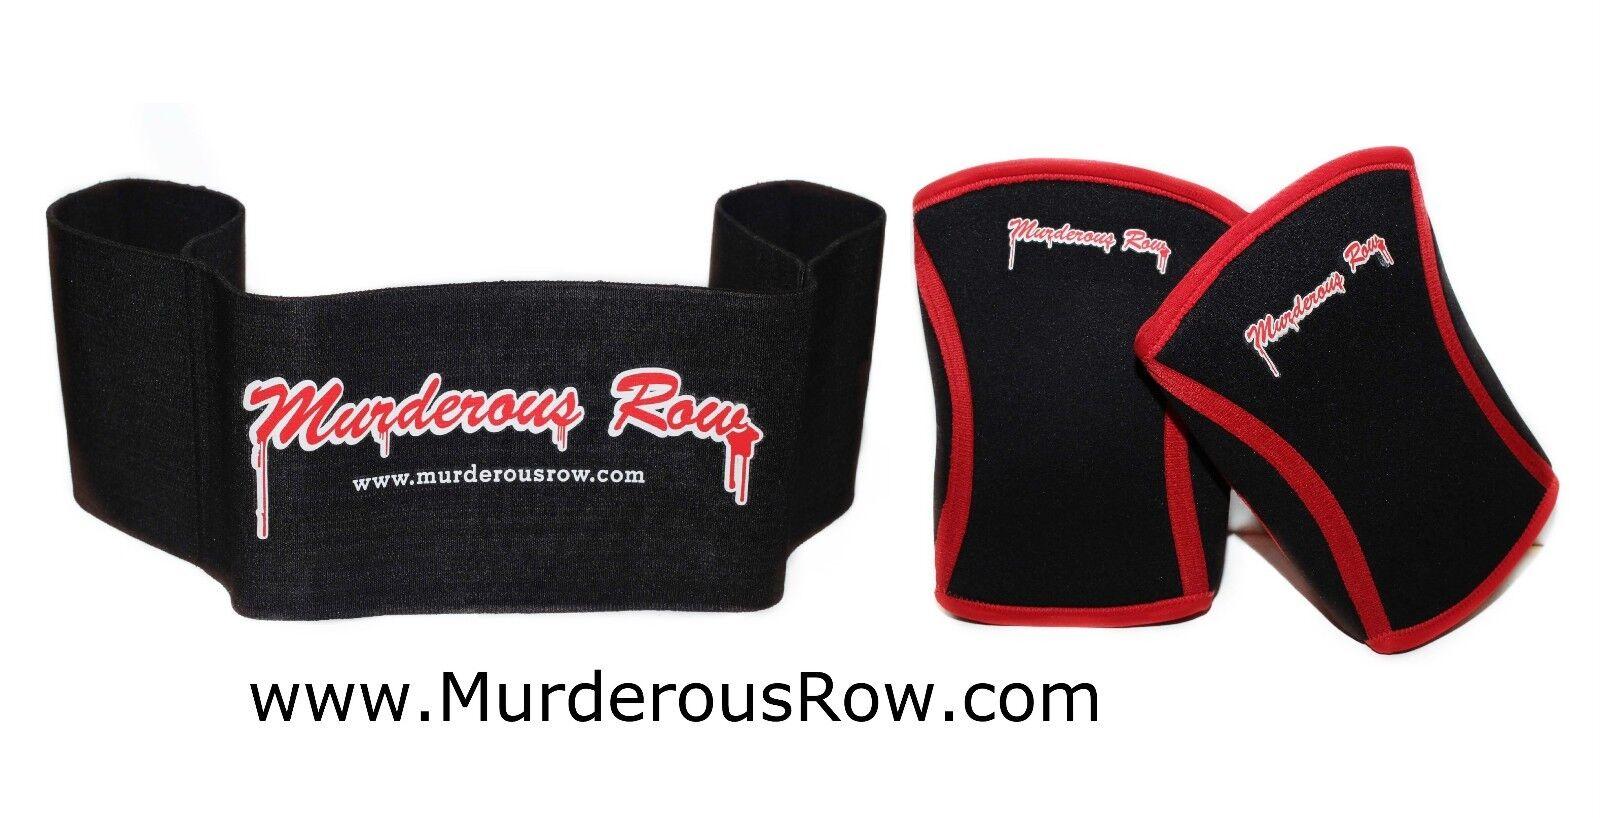 MURDEROUS ROW  Bench Press Sling Shot(XL) + X-Heat Knee Sleeves Set - FAST SHIP  lowest whole network